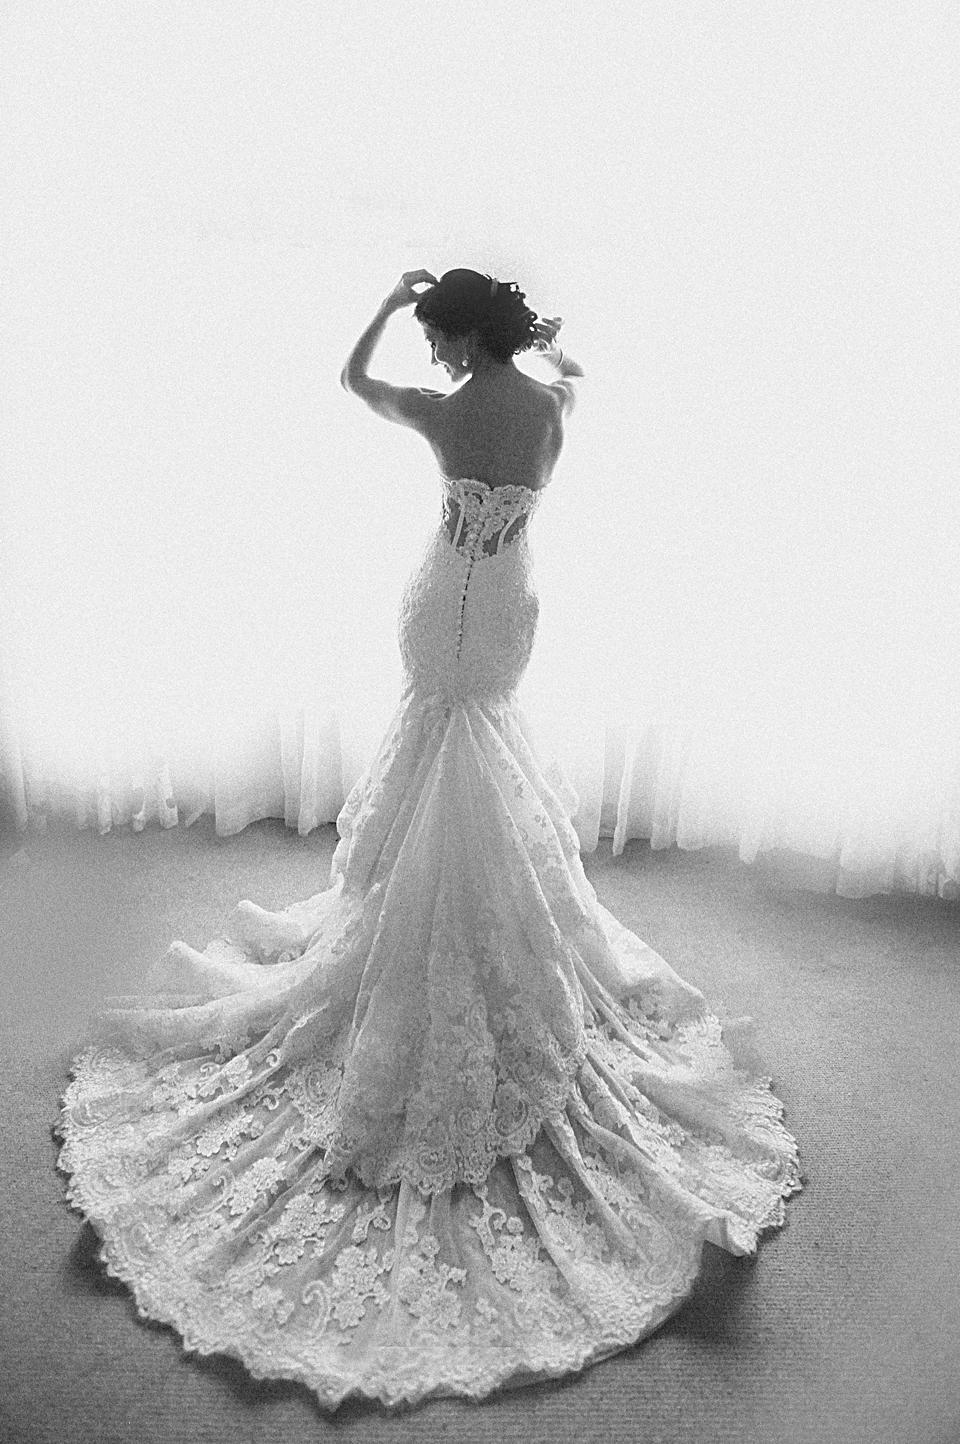 nicole-flint-miss-southafrica-wedding-cranford-country-lodge-wedding-weddingphotographers-desitnationweddings-parisweddings-009.jpg